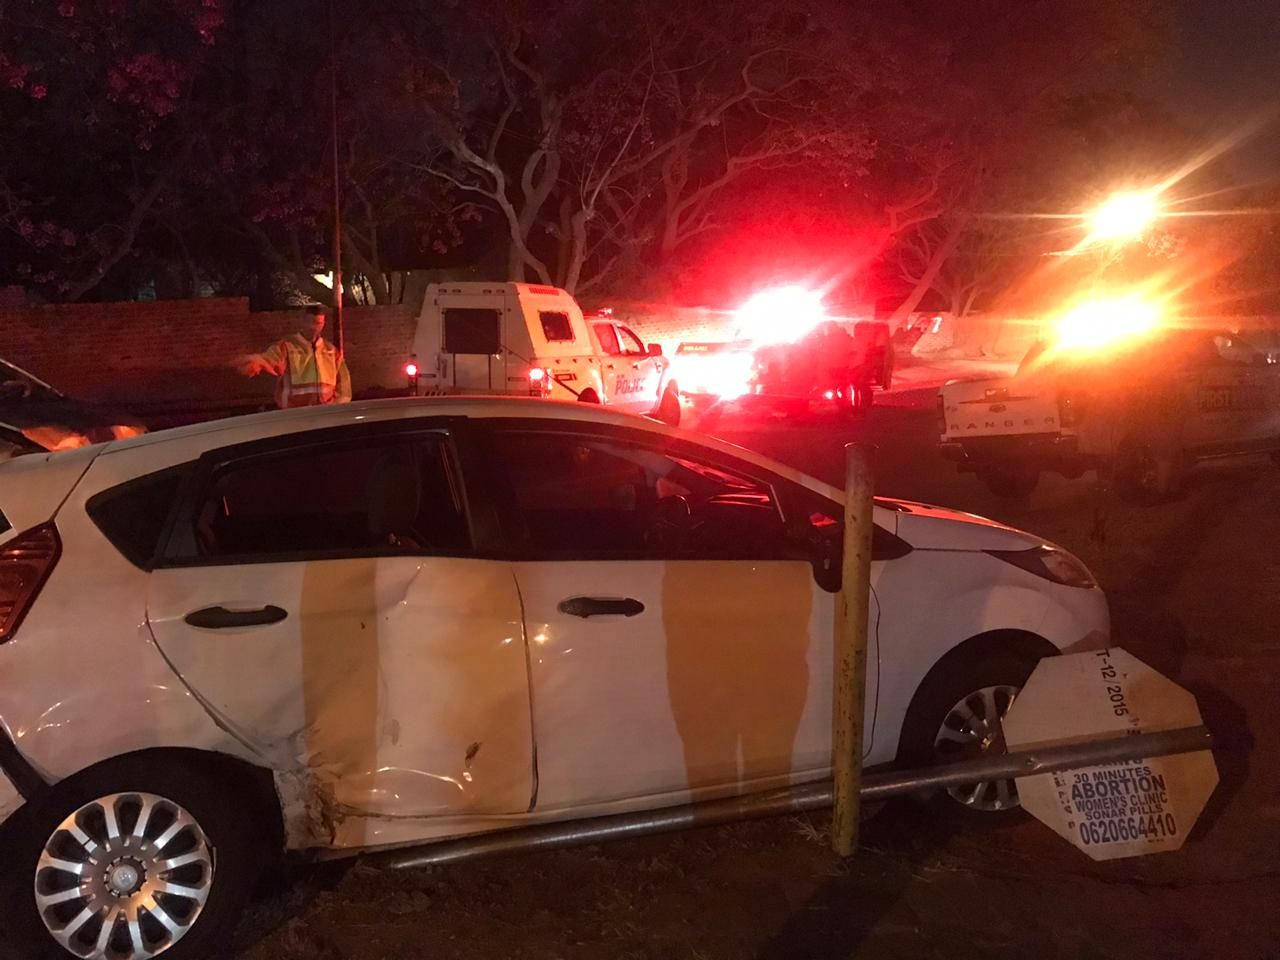 One person injured in collision in Randburg